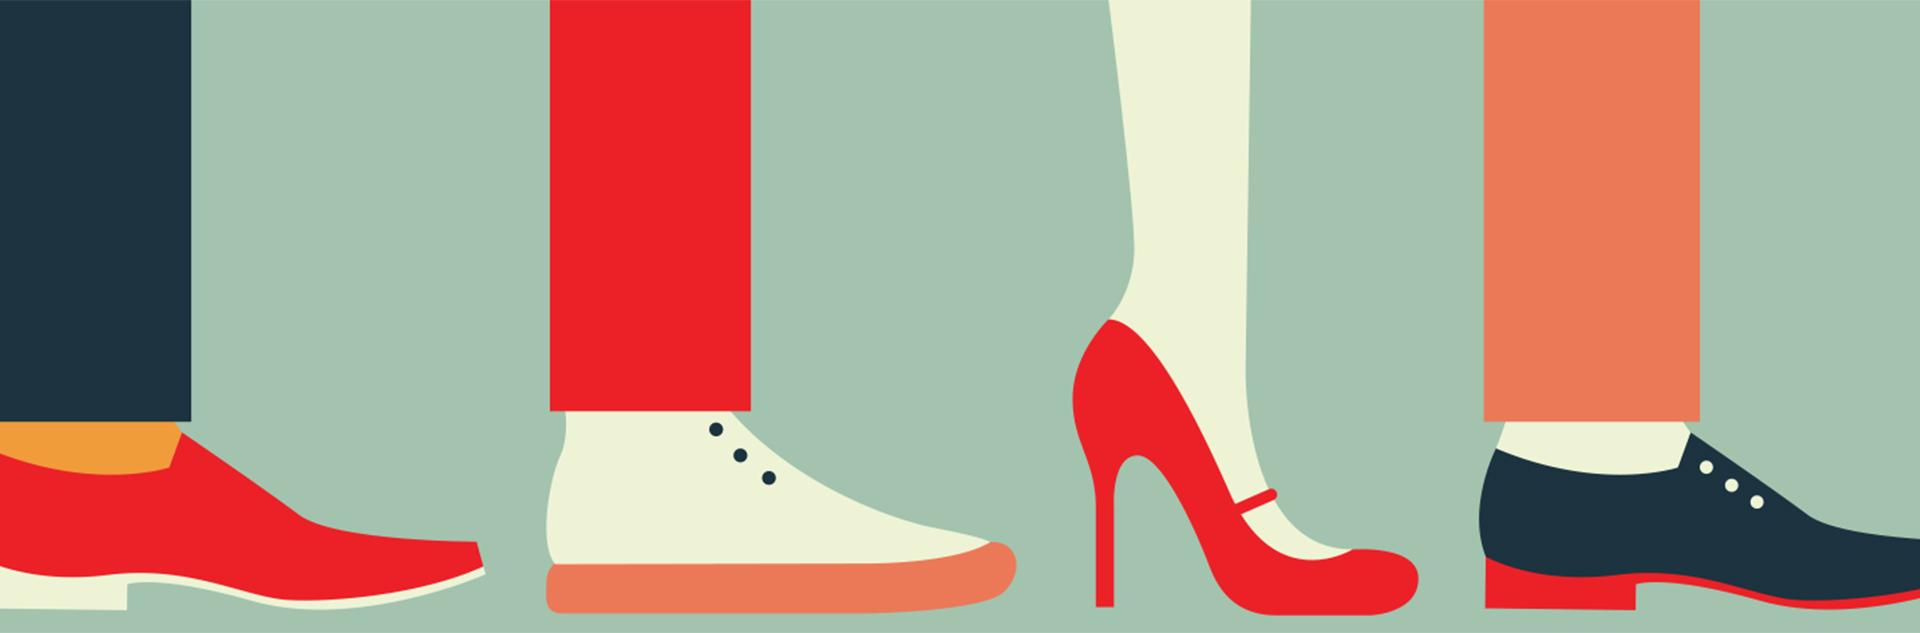 IDKT-about-Elton-John---Young-Illustration-&-Animation-Studio-Manchester-2D,-MOTION-GRAPHICS,-INFOGRAPHICS,elton,shoes,-heels.jpg